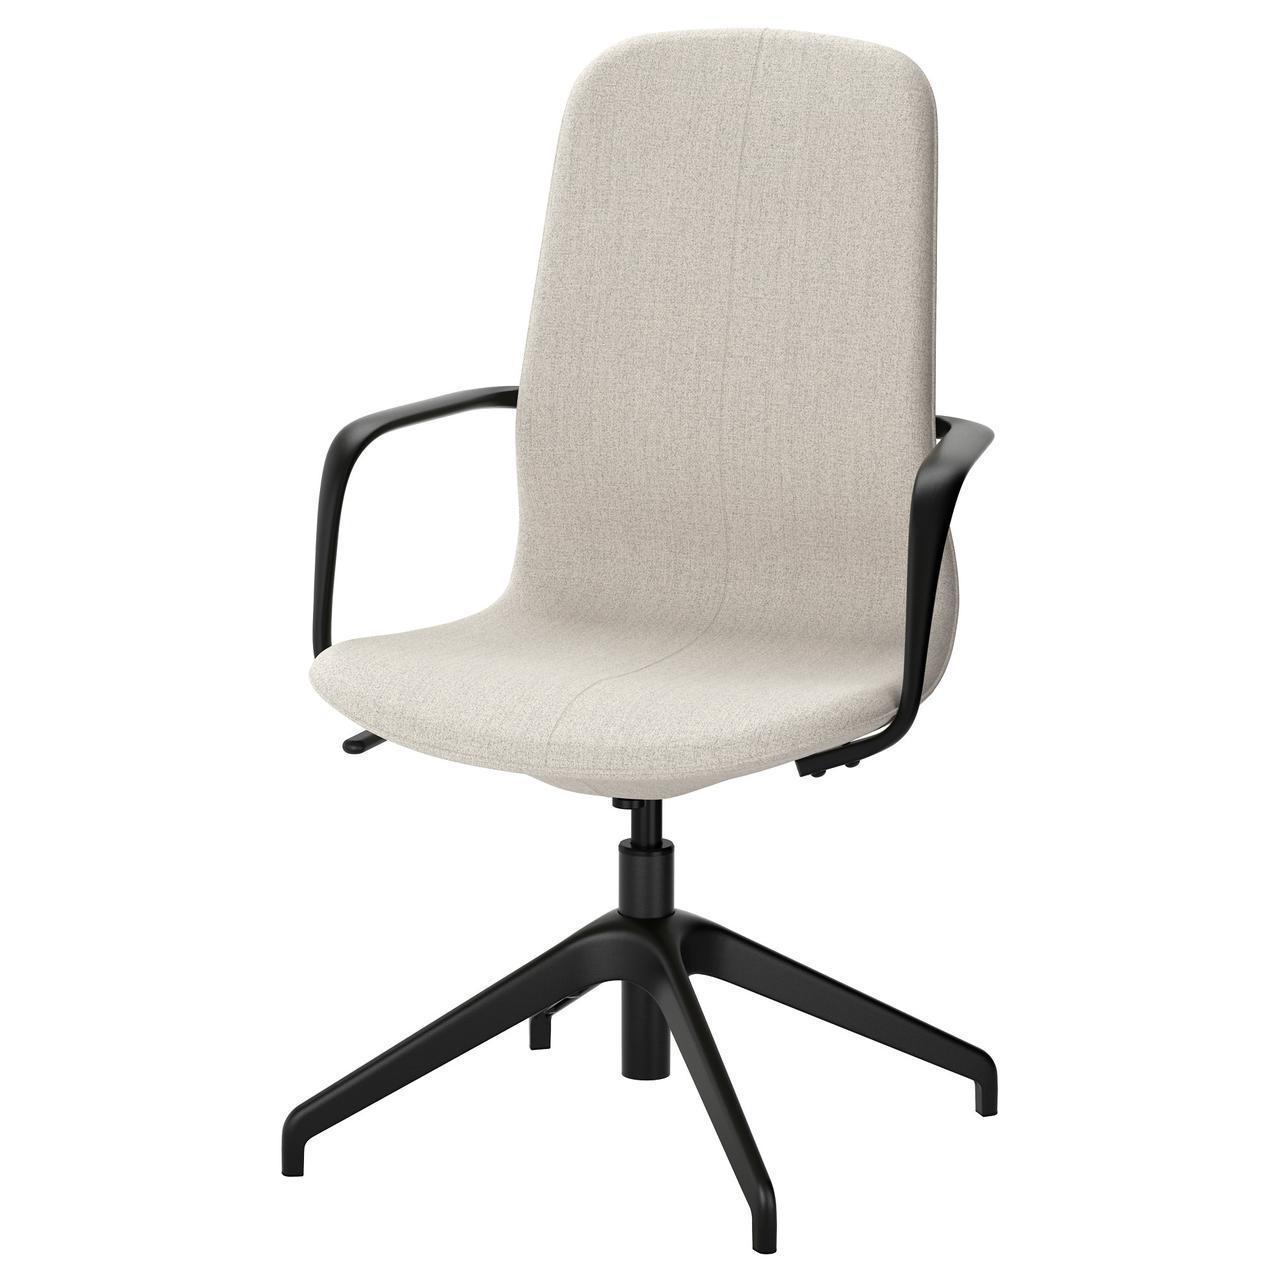 Компьютерное кресло IKEA LÅNGFJÄLL Gunnared бежевое черное 191.763.01